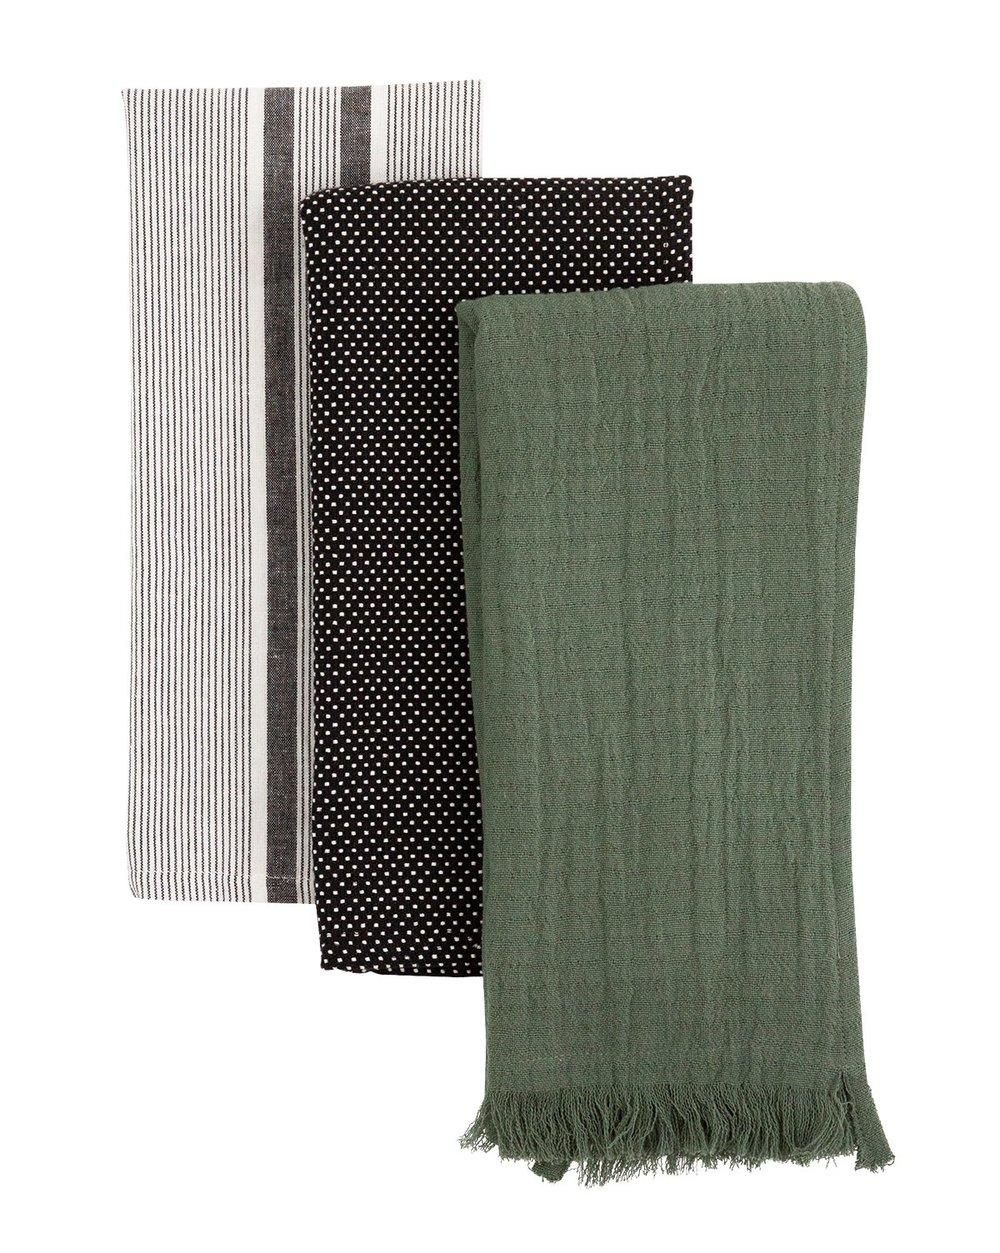 cotton_tea_towels28.jpg